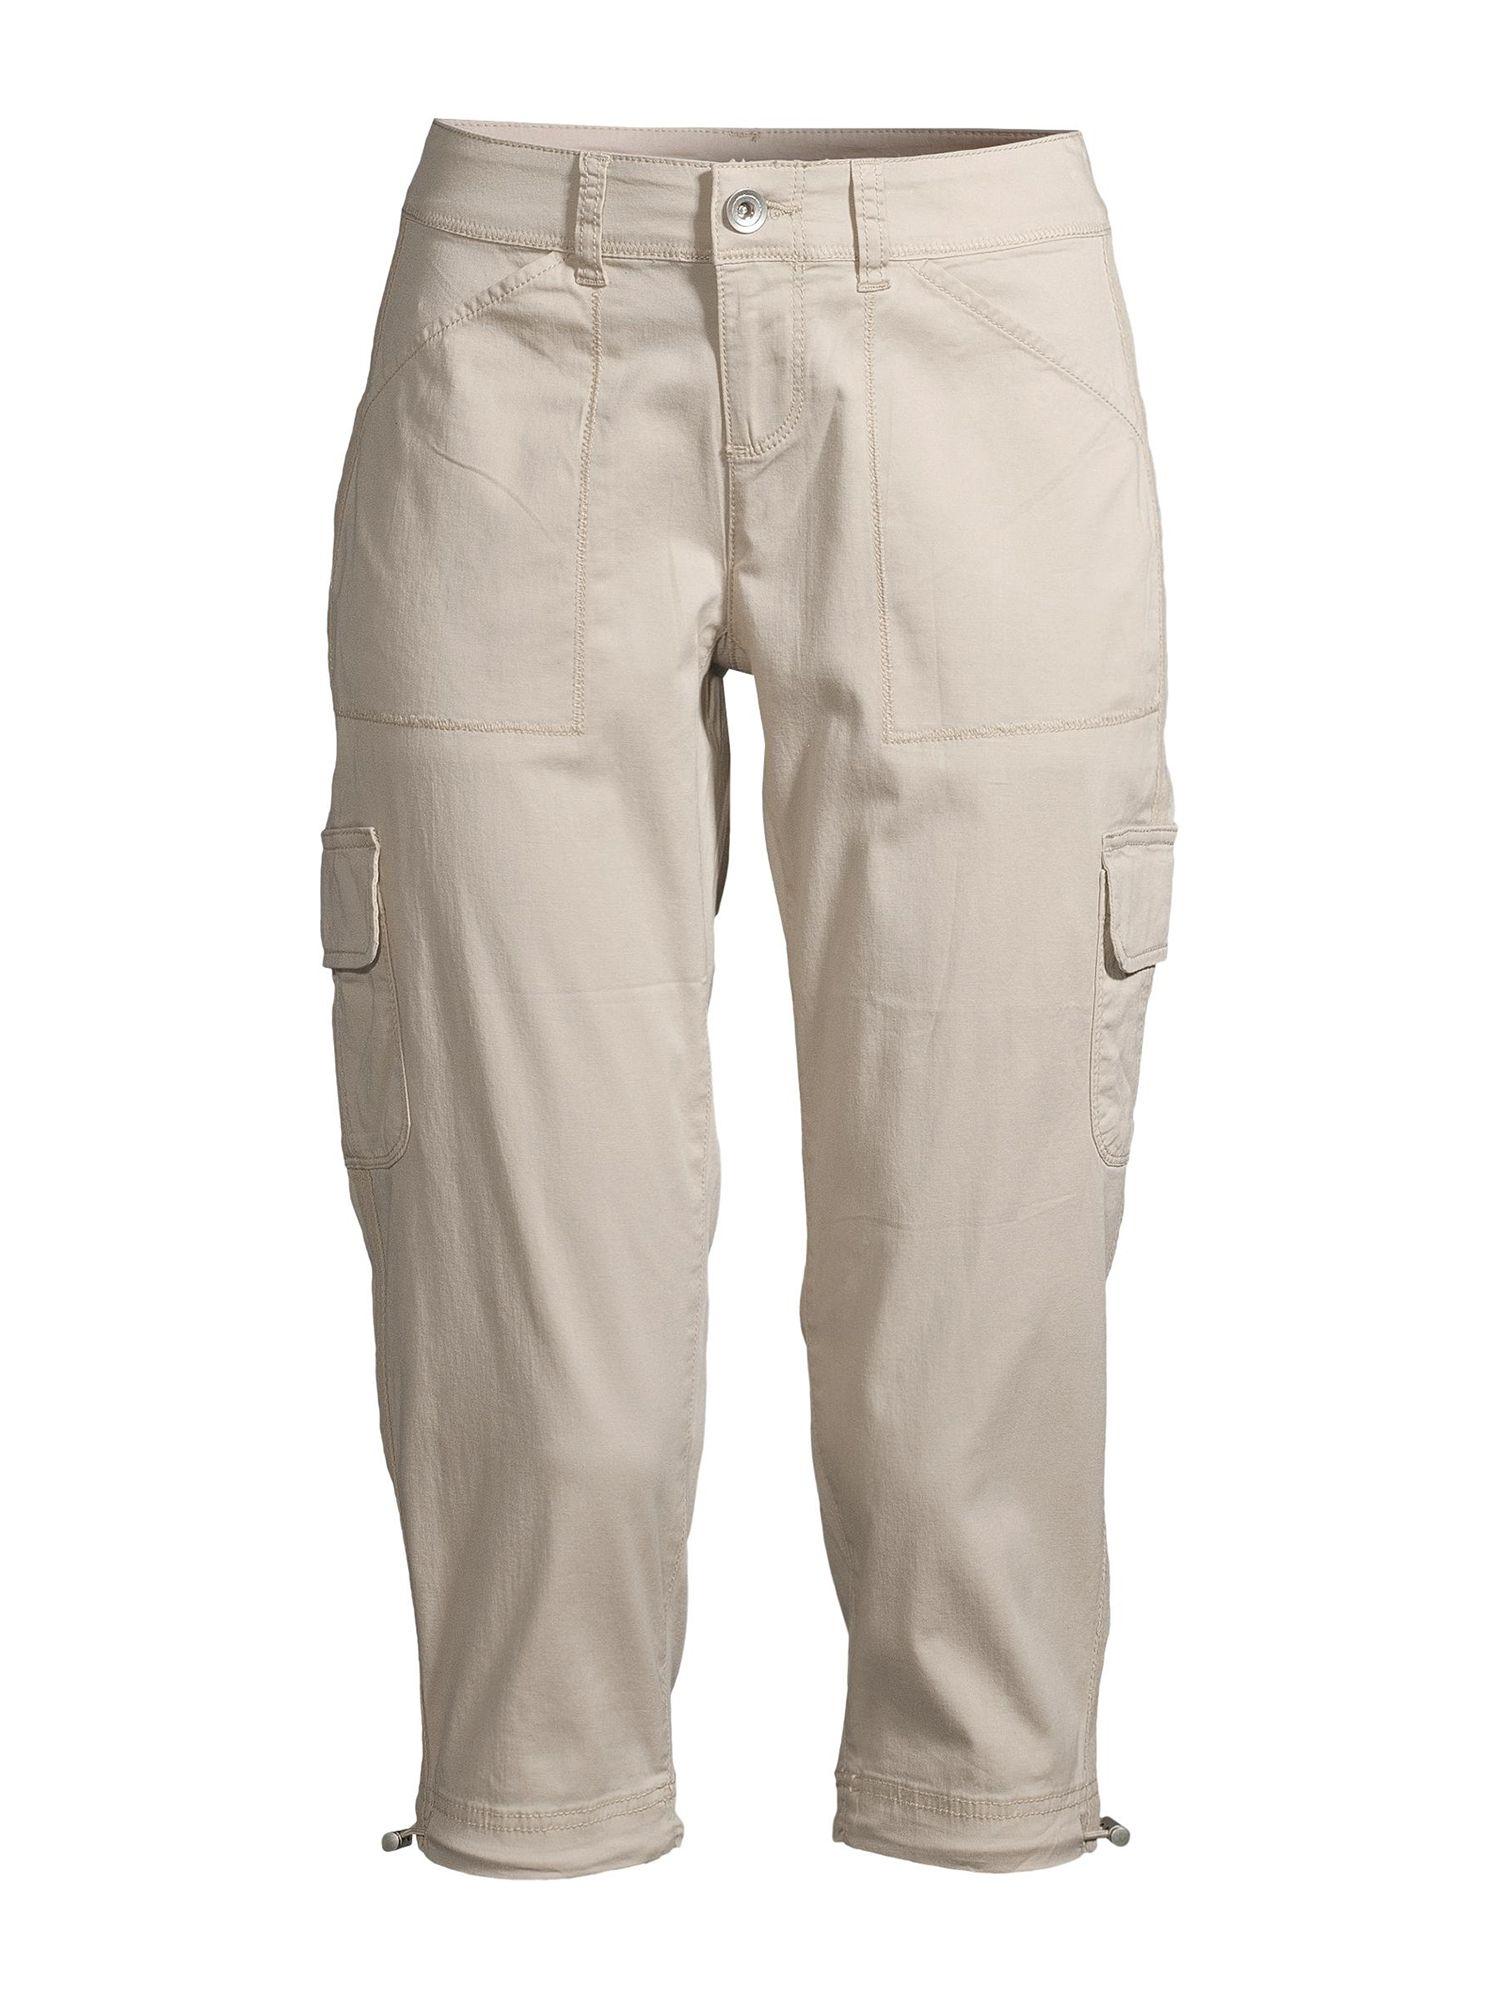 Time And Tru Women S Cargo Capri Pants Ad Women Affiliate Tru Time Womens Cargo Capri Pants Capri Pants Pants [ 2000 x 1500 Pixel ]